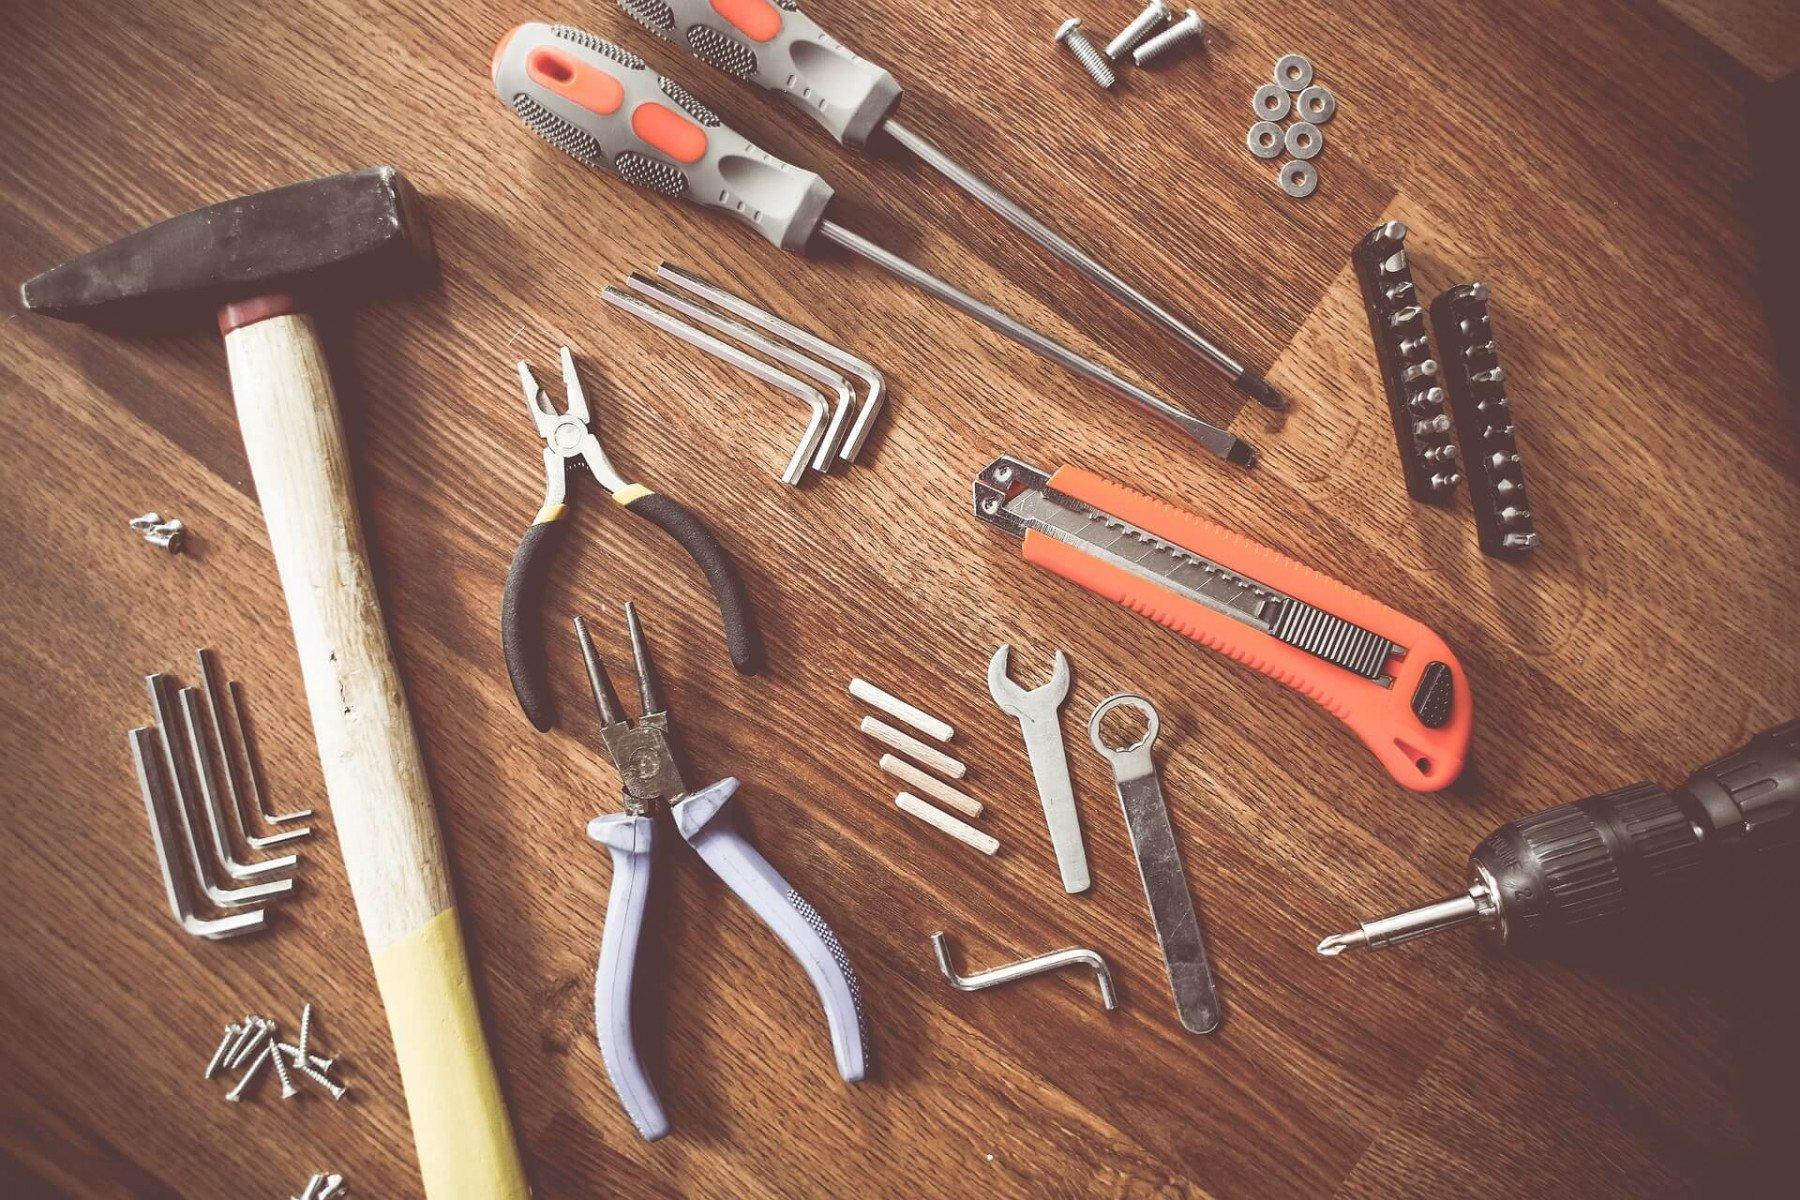 En massa verktyg ligger på ett golv